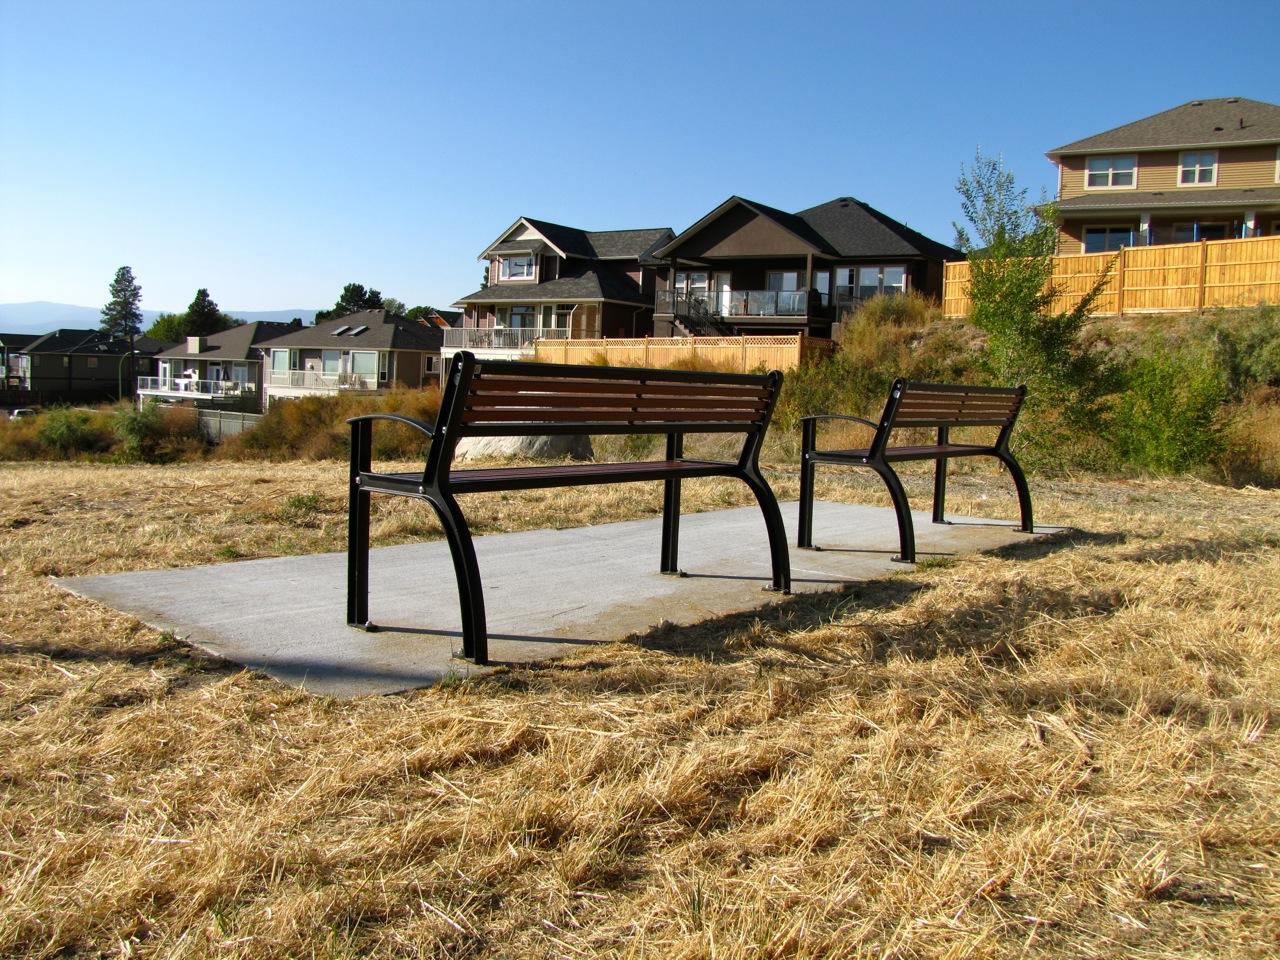 Beselt Park Bench All Metal Wishbone Site Furnishings